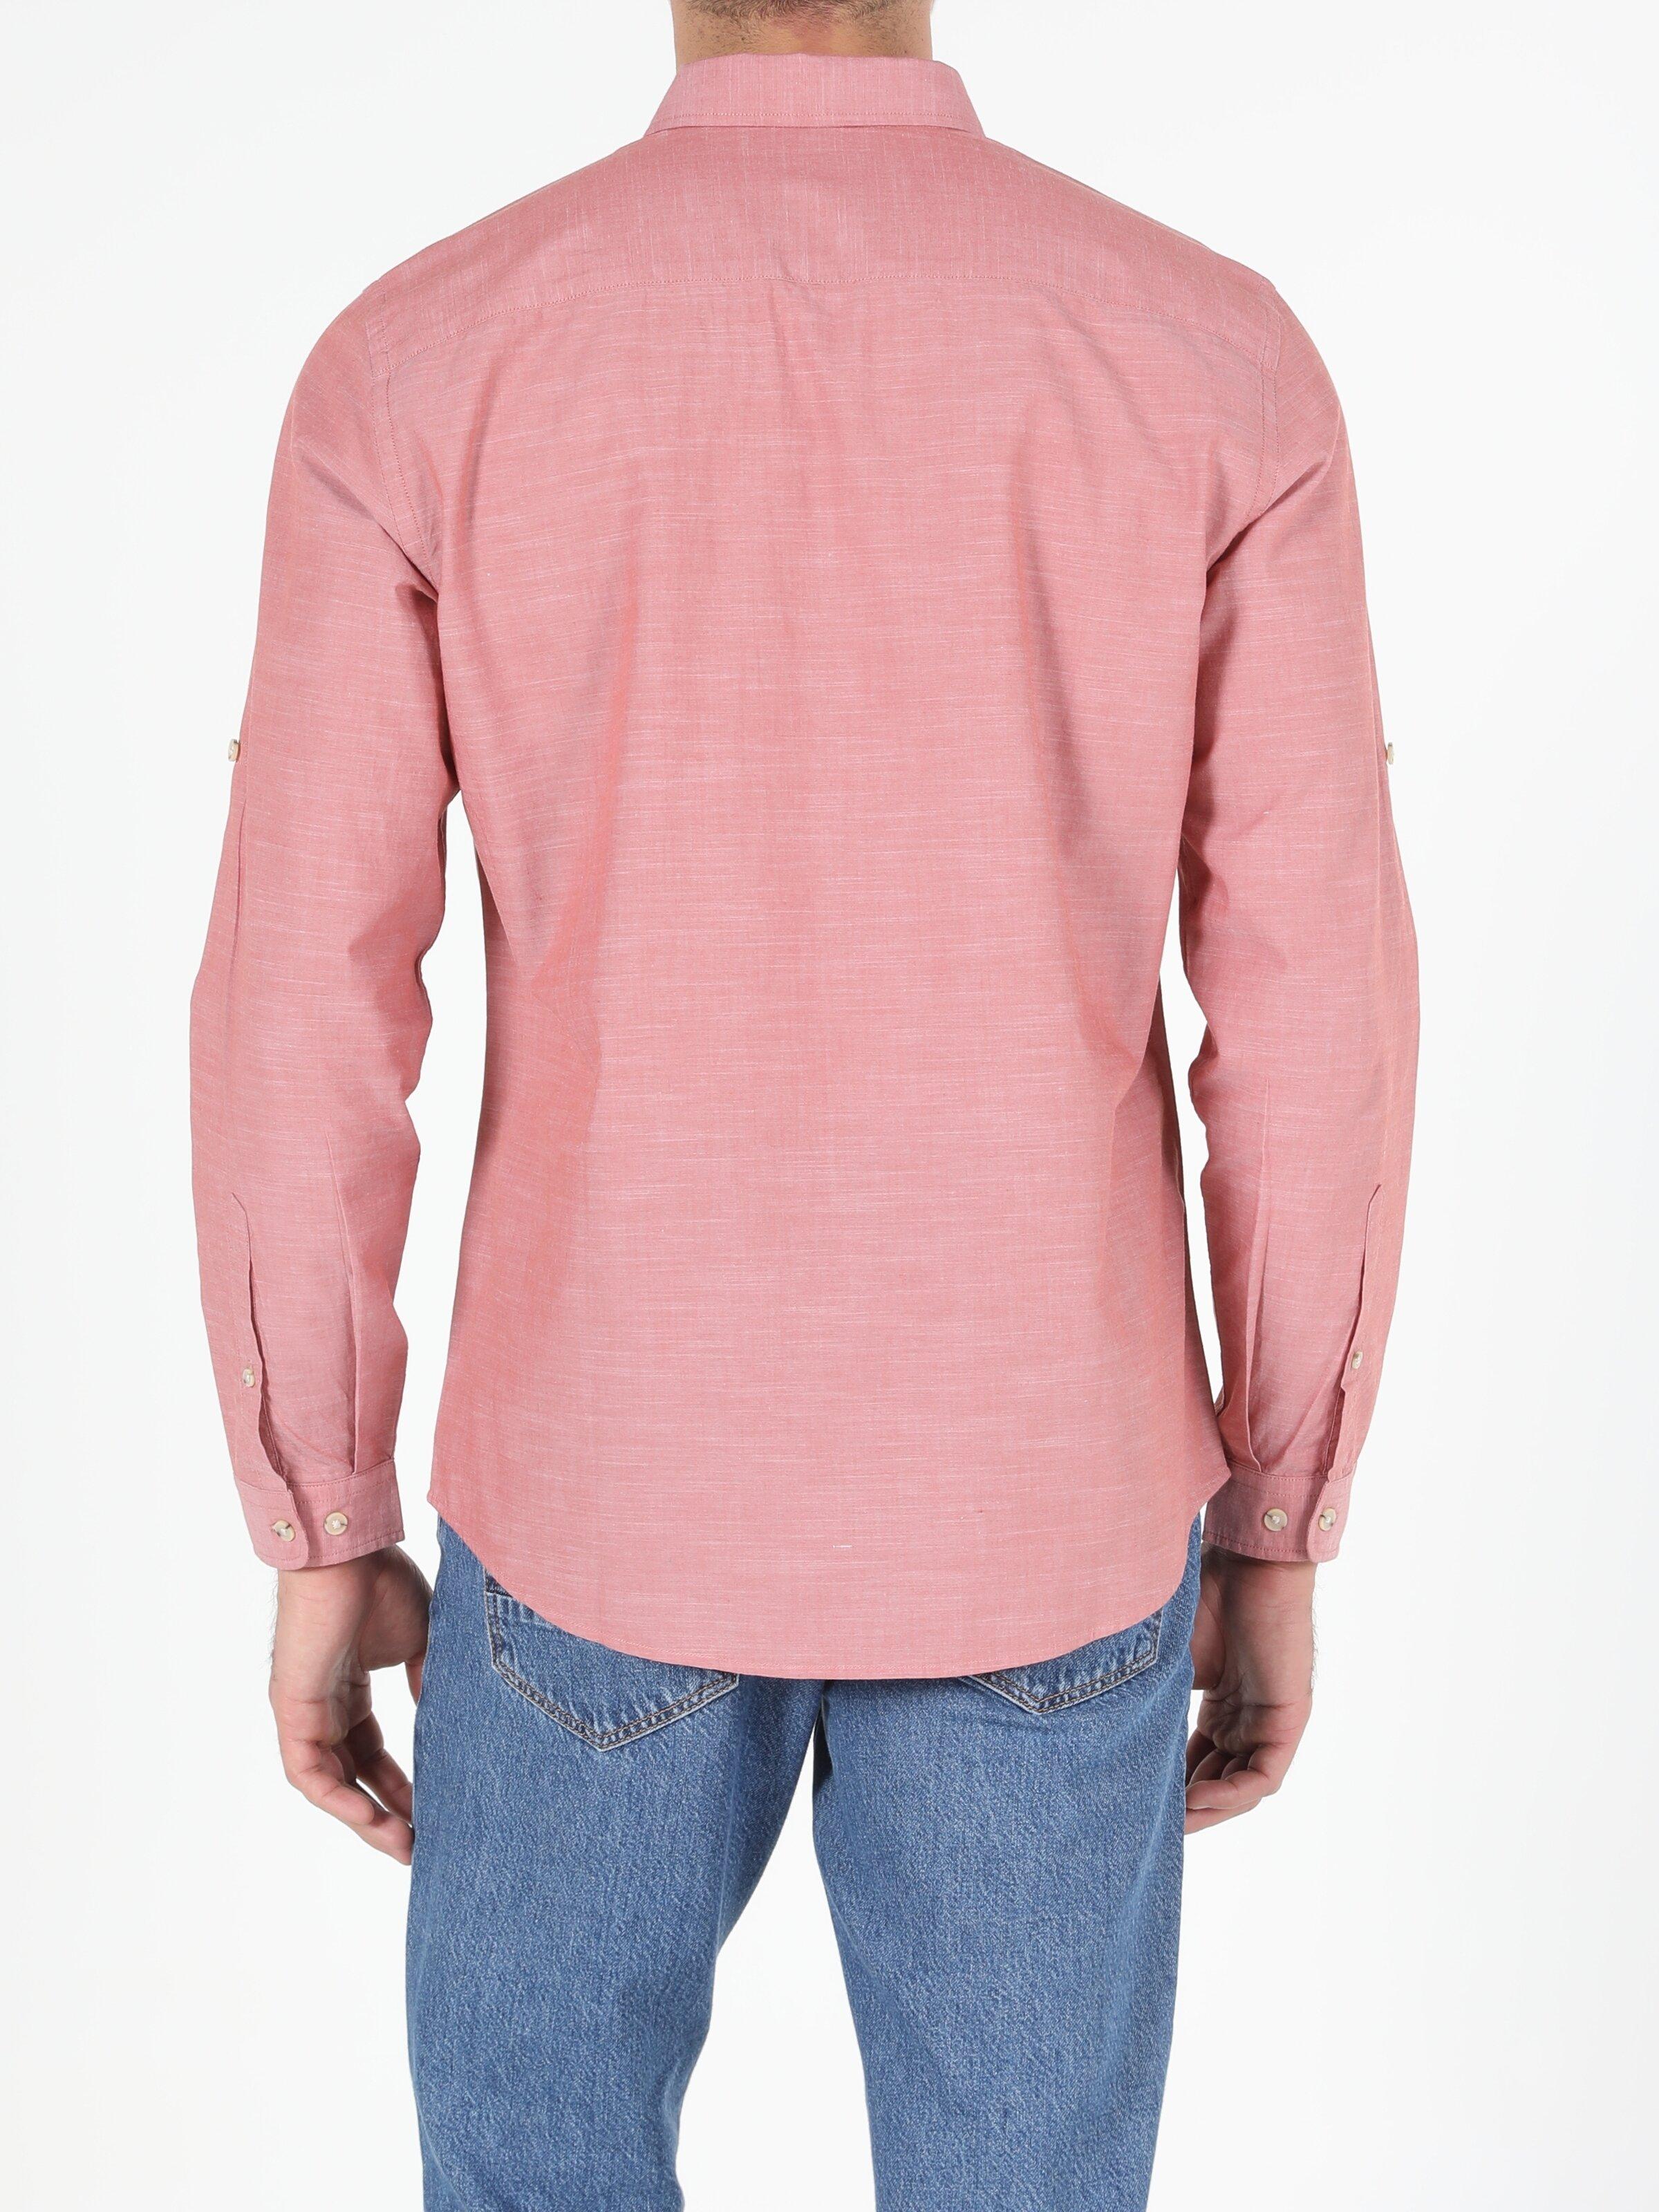 Regular Fit Shirt Neck Erkek Kiremit Uzun Kol Gömlek